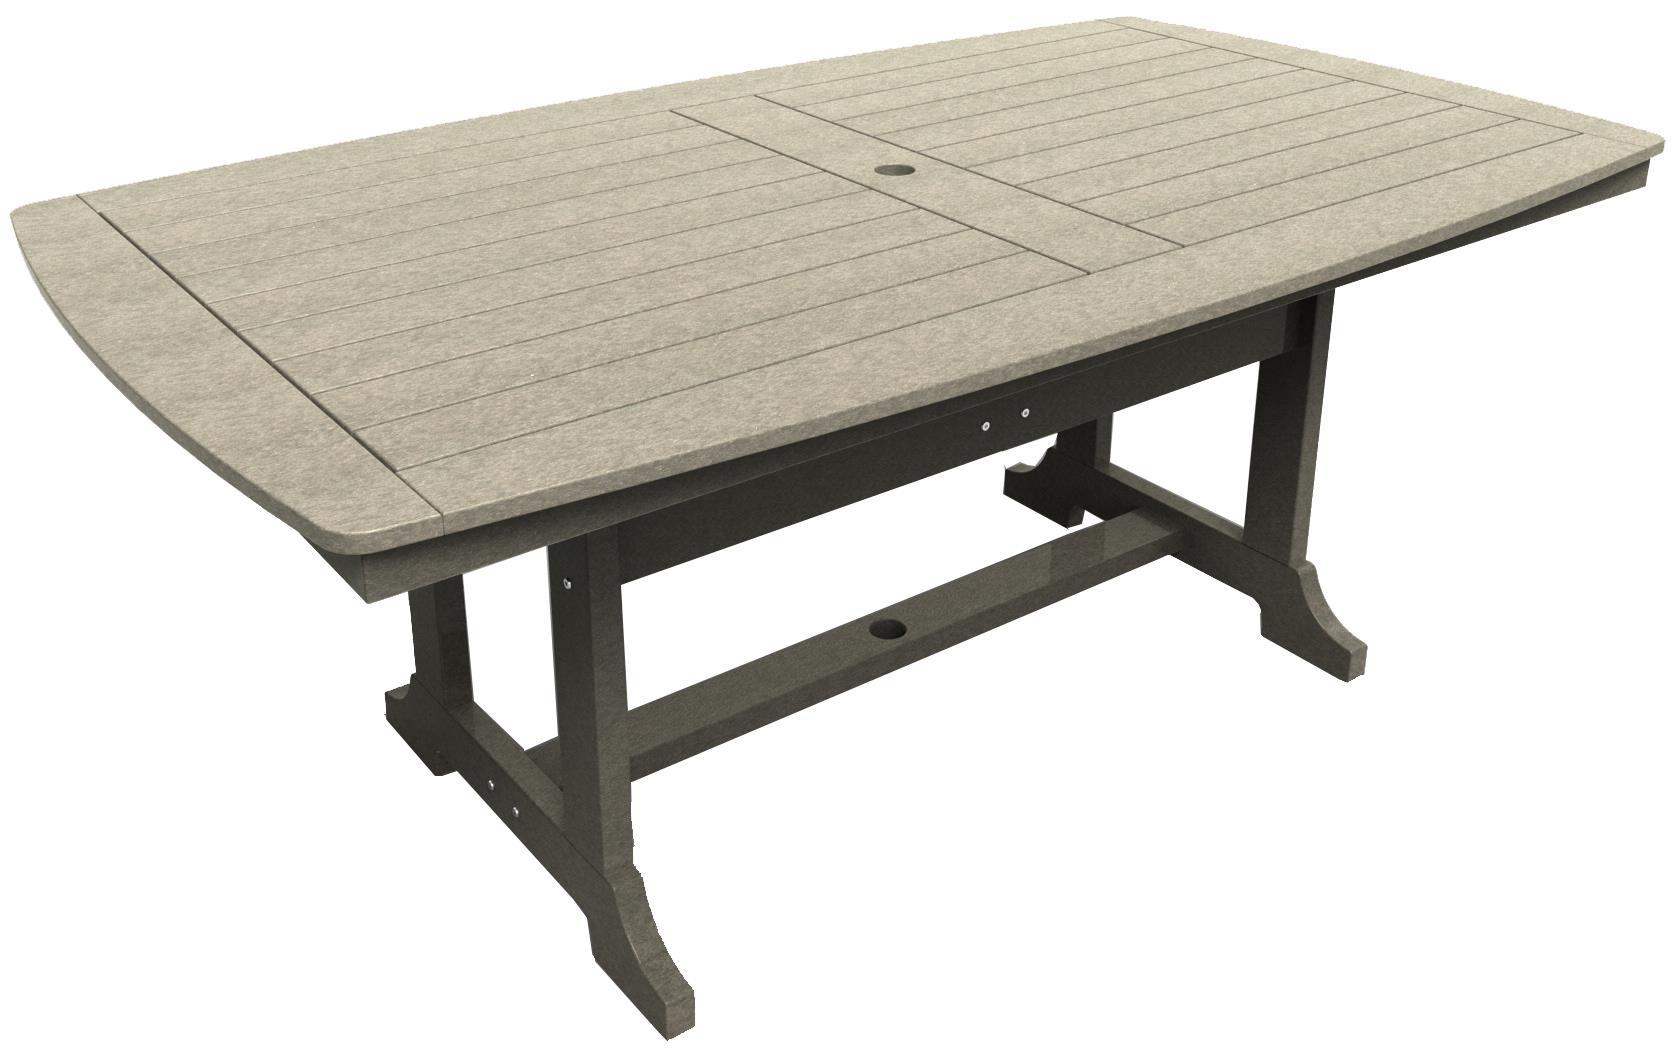 Malibu Outdoor Living Malibu Outdoor FurnitureNapa Dining Table